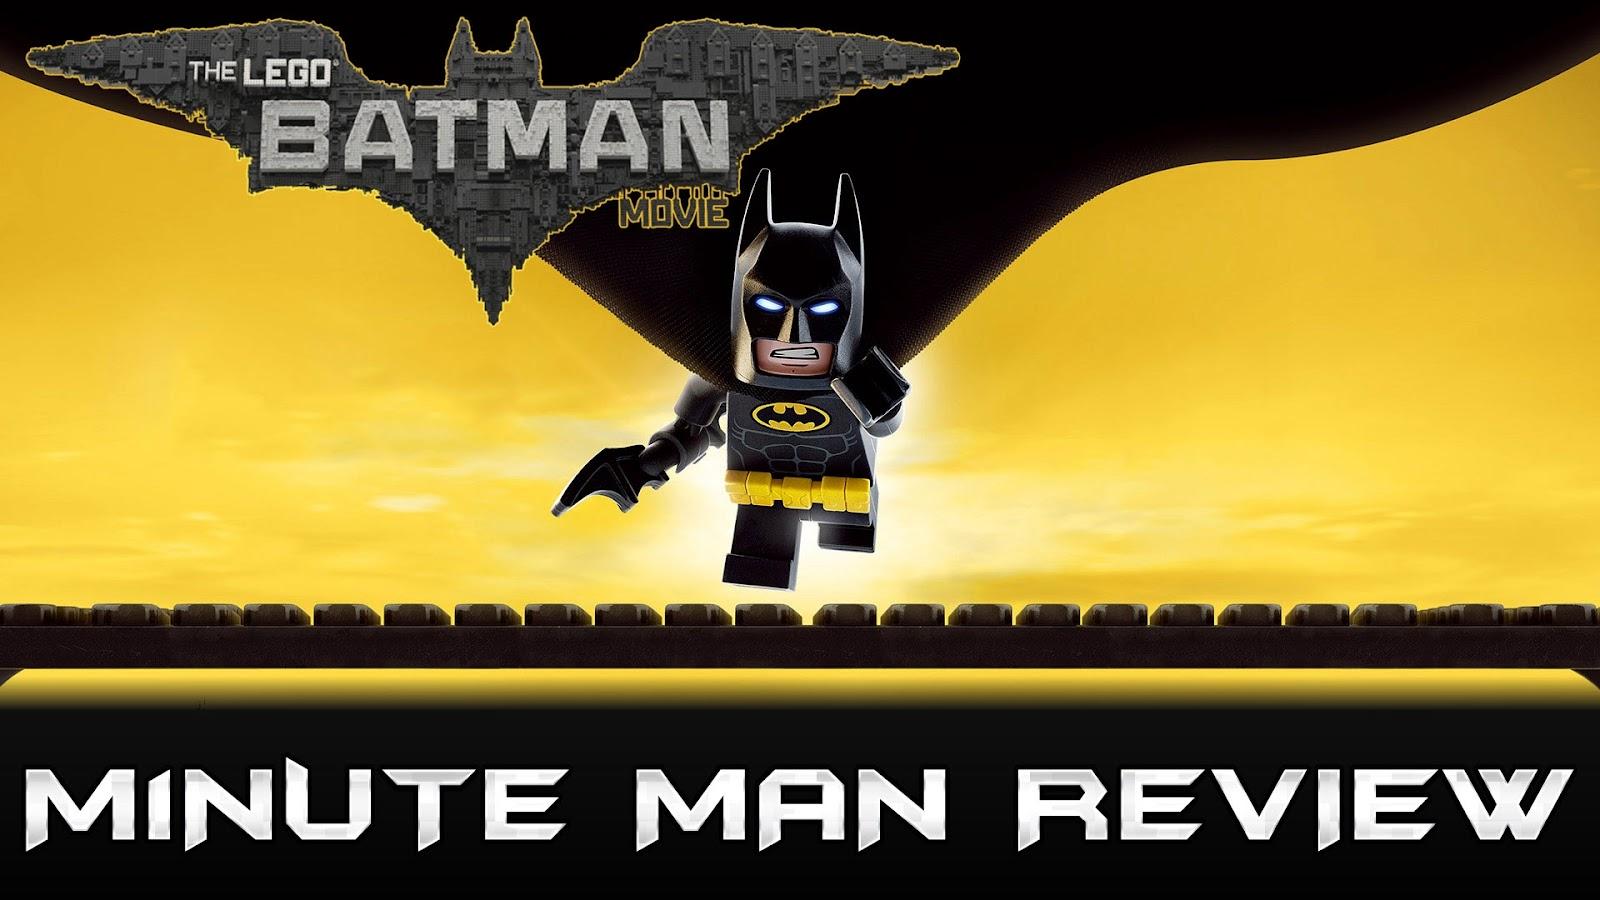 movie review THE LEGO BATMAN MOVIE podcast